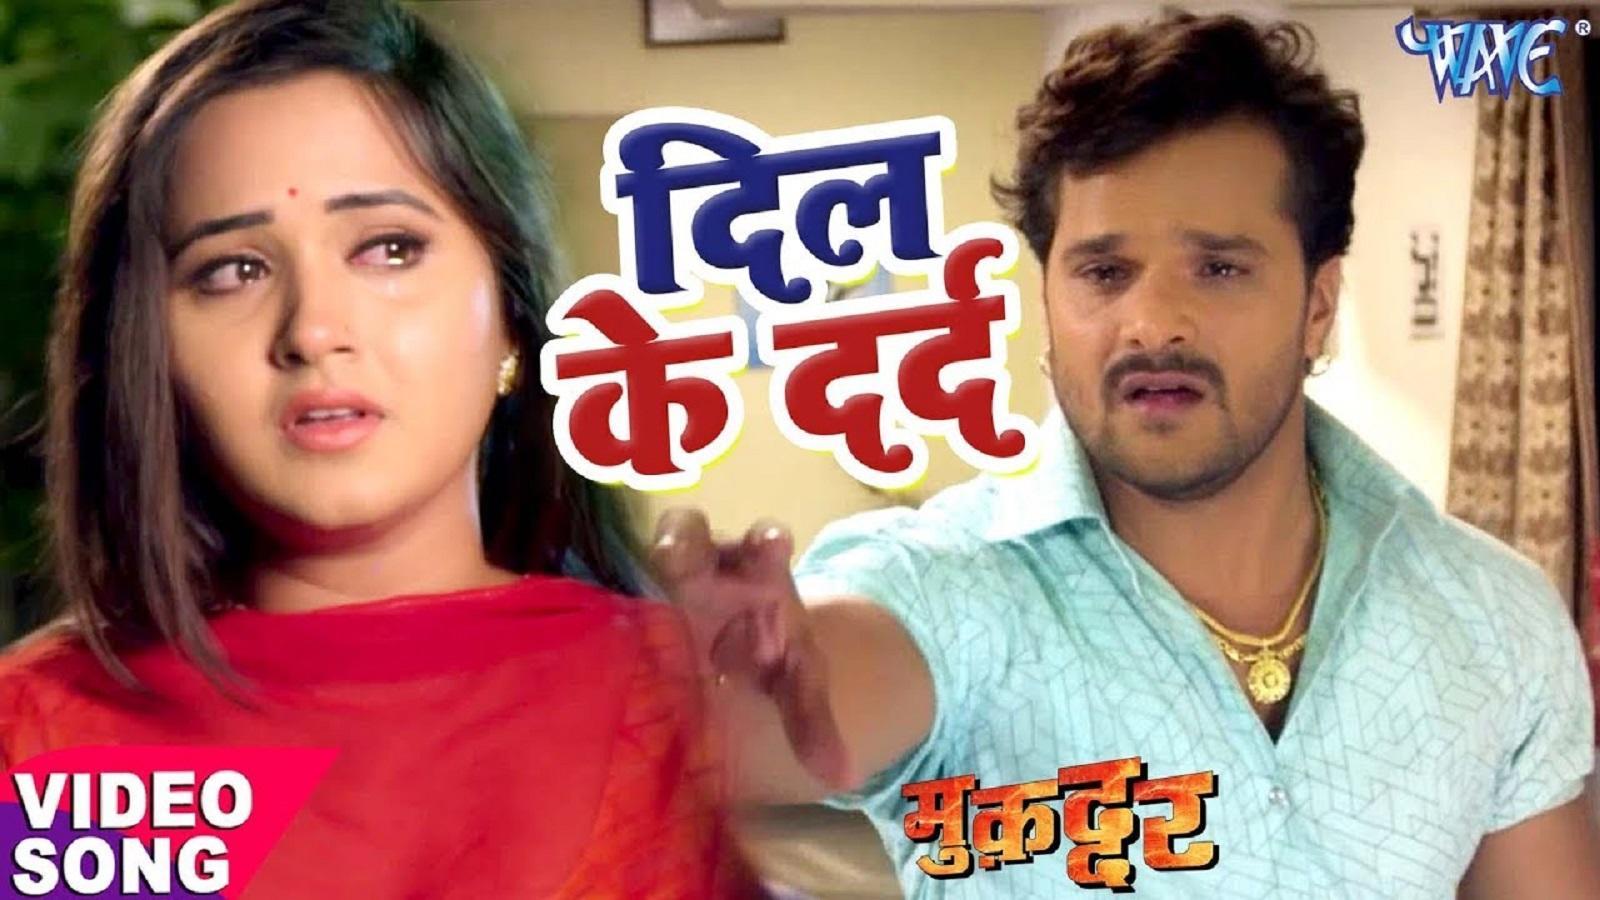 Khesari Lal Yadav Ka Sad Bhojpuri Gana Video Song: Khesari Lal Yadav and  Kajal Raghwani's Bhojpuri song 'Dil Ke Darad' from 'Muqaddar'